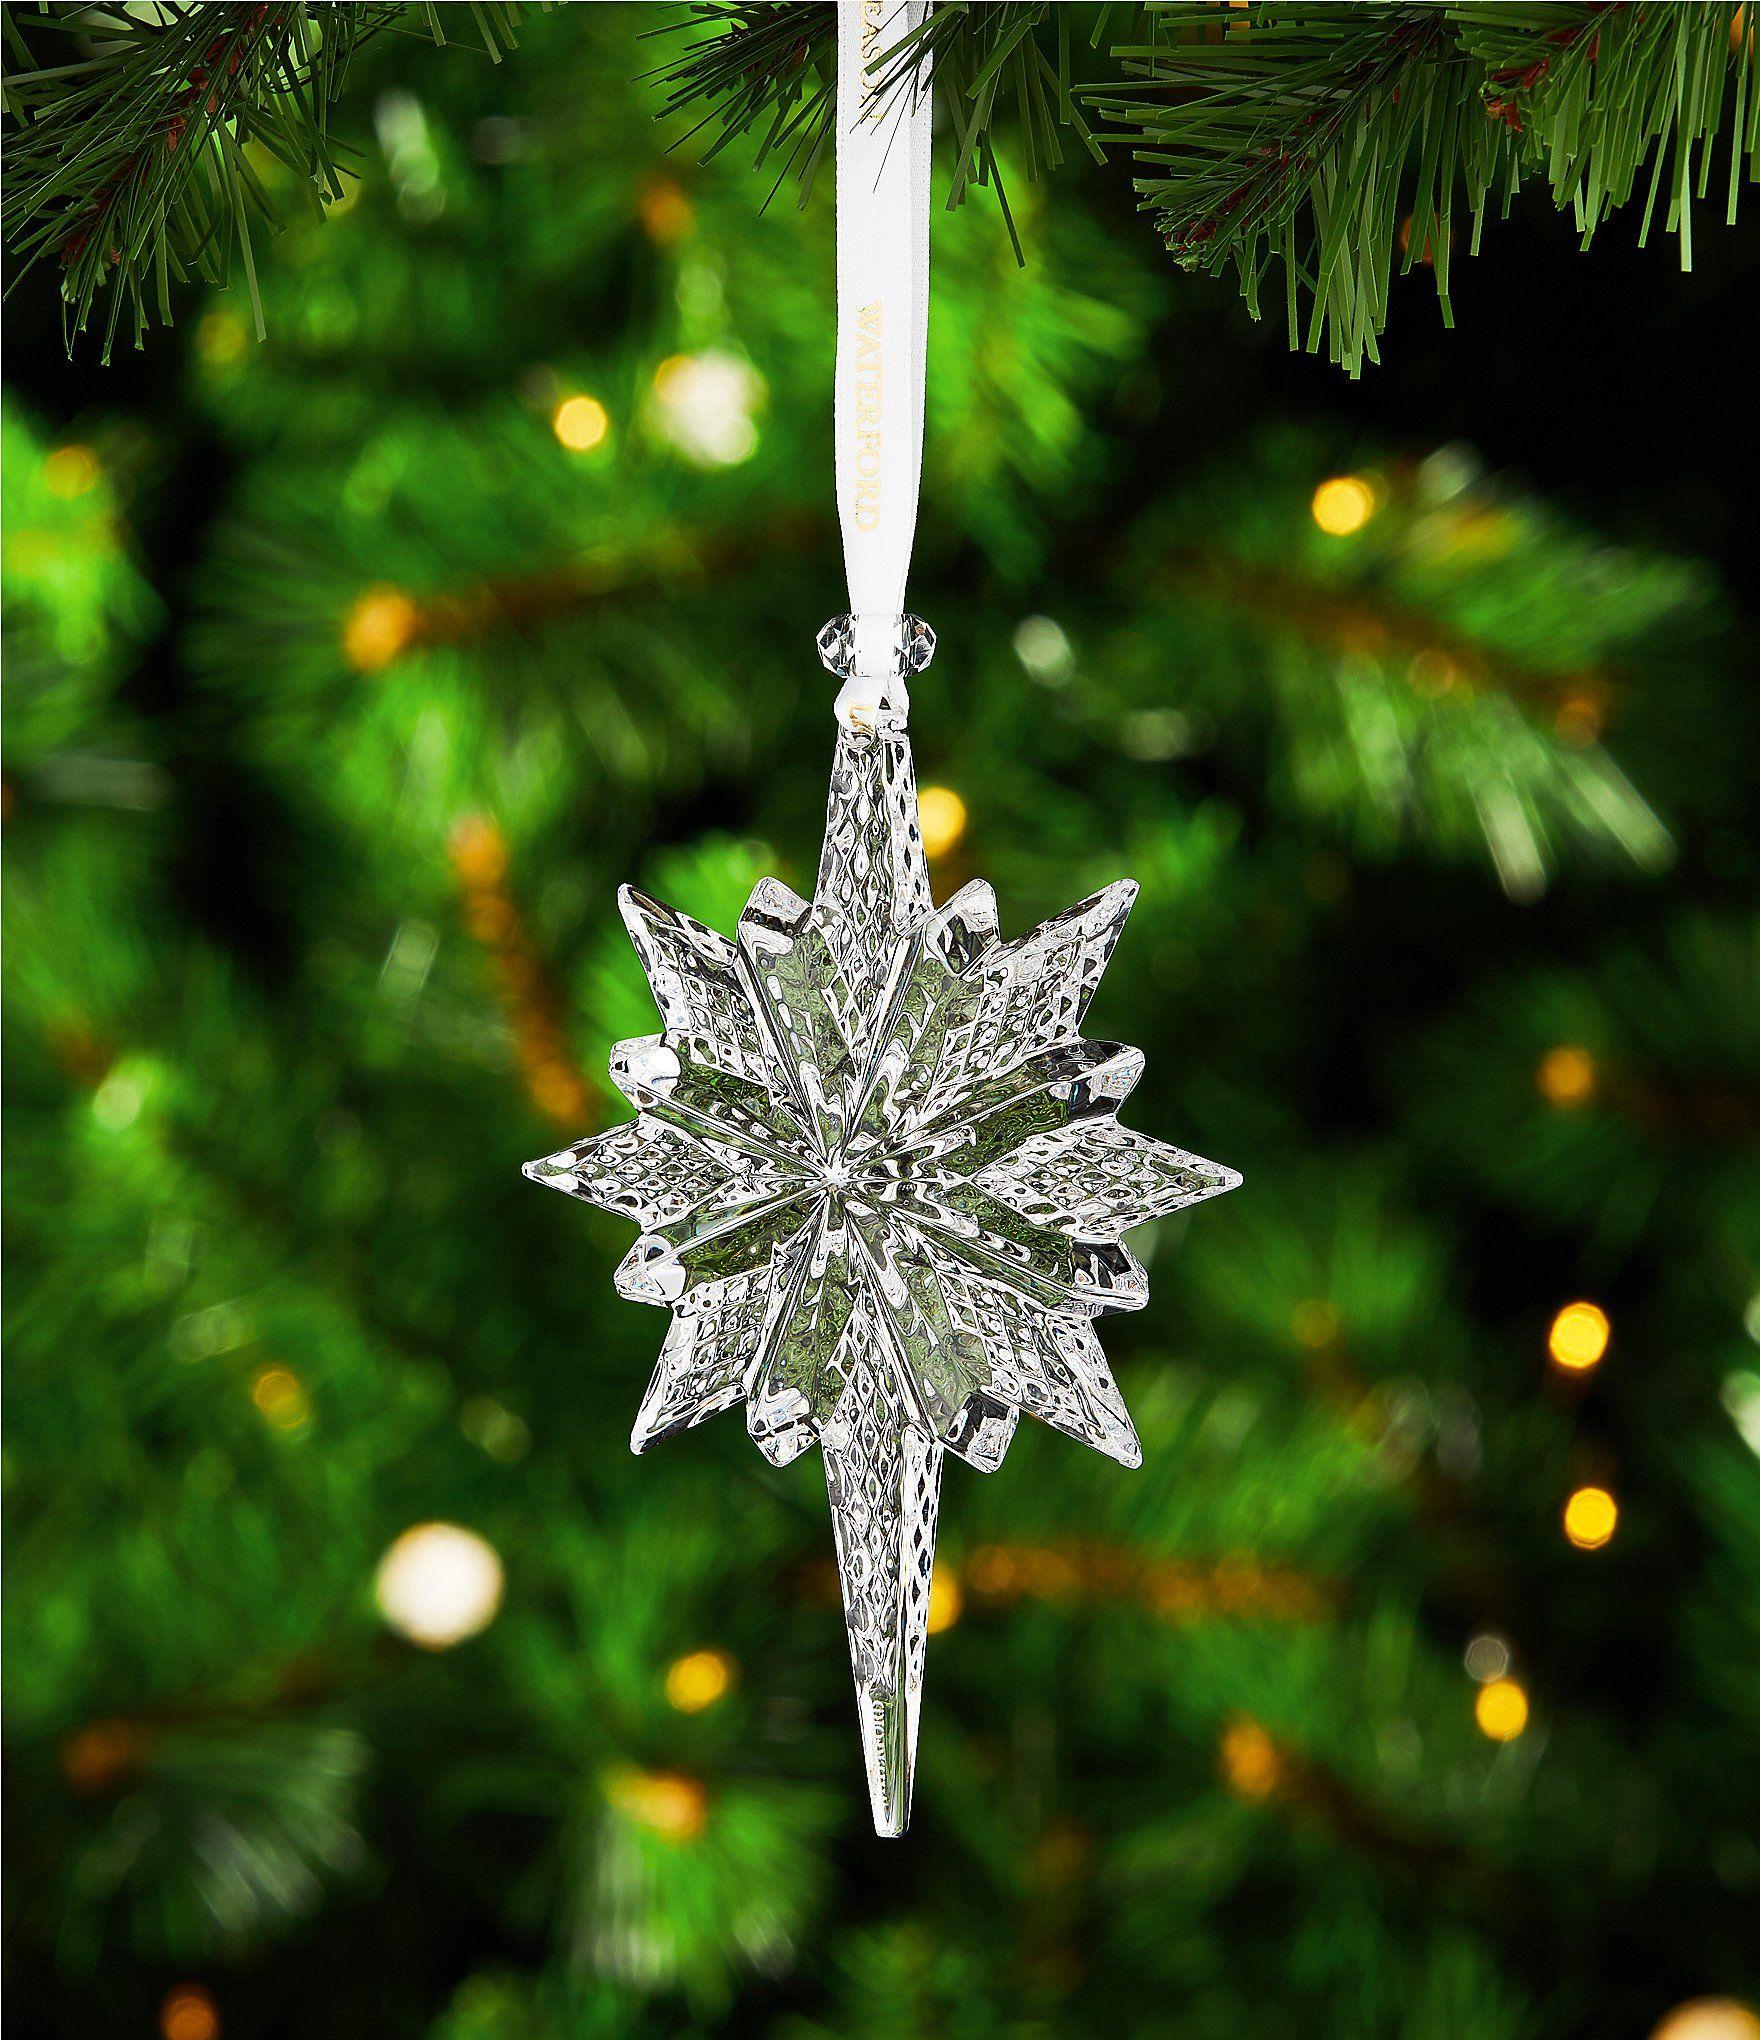 Waterford Crystal 2018 Snow Star Ornament Dillards Christmas Tree Decorations Hobby Lobby Christmas Ornaments Easy Christmas Decorations